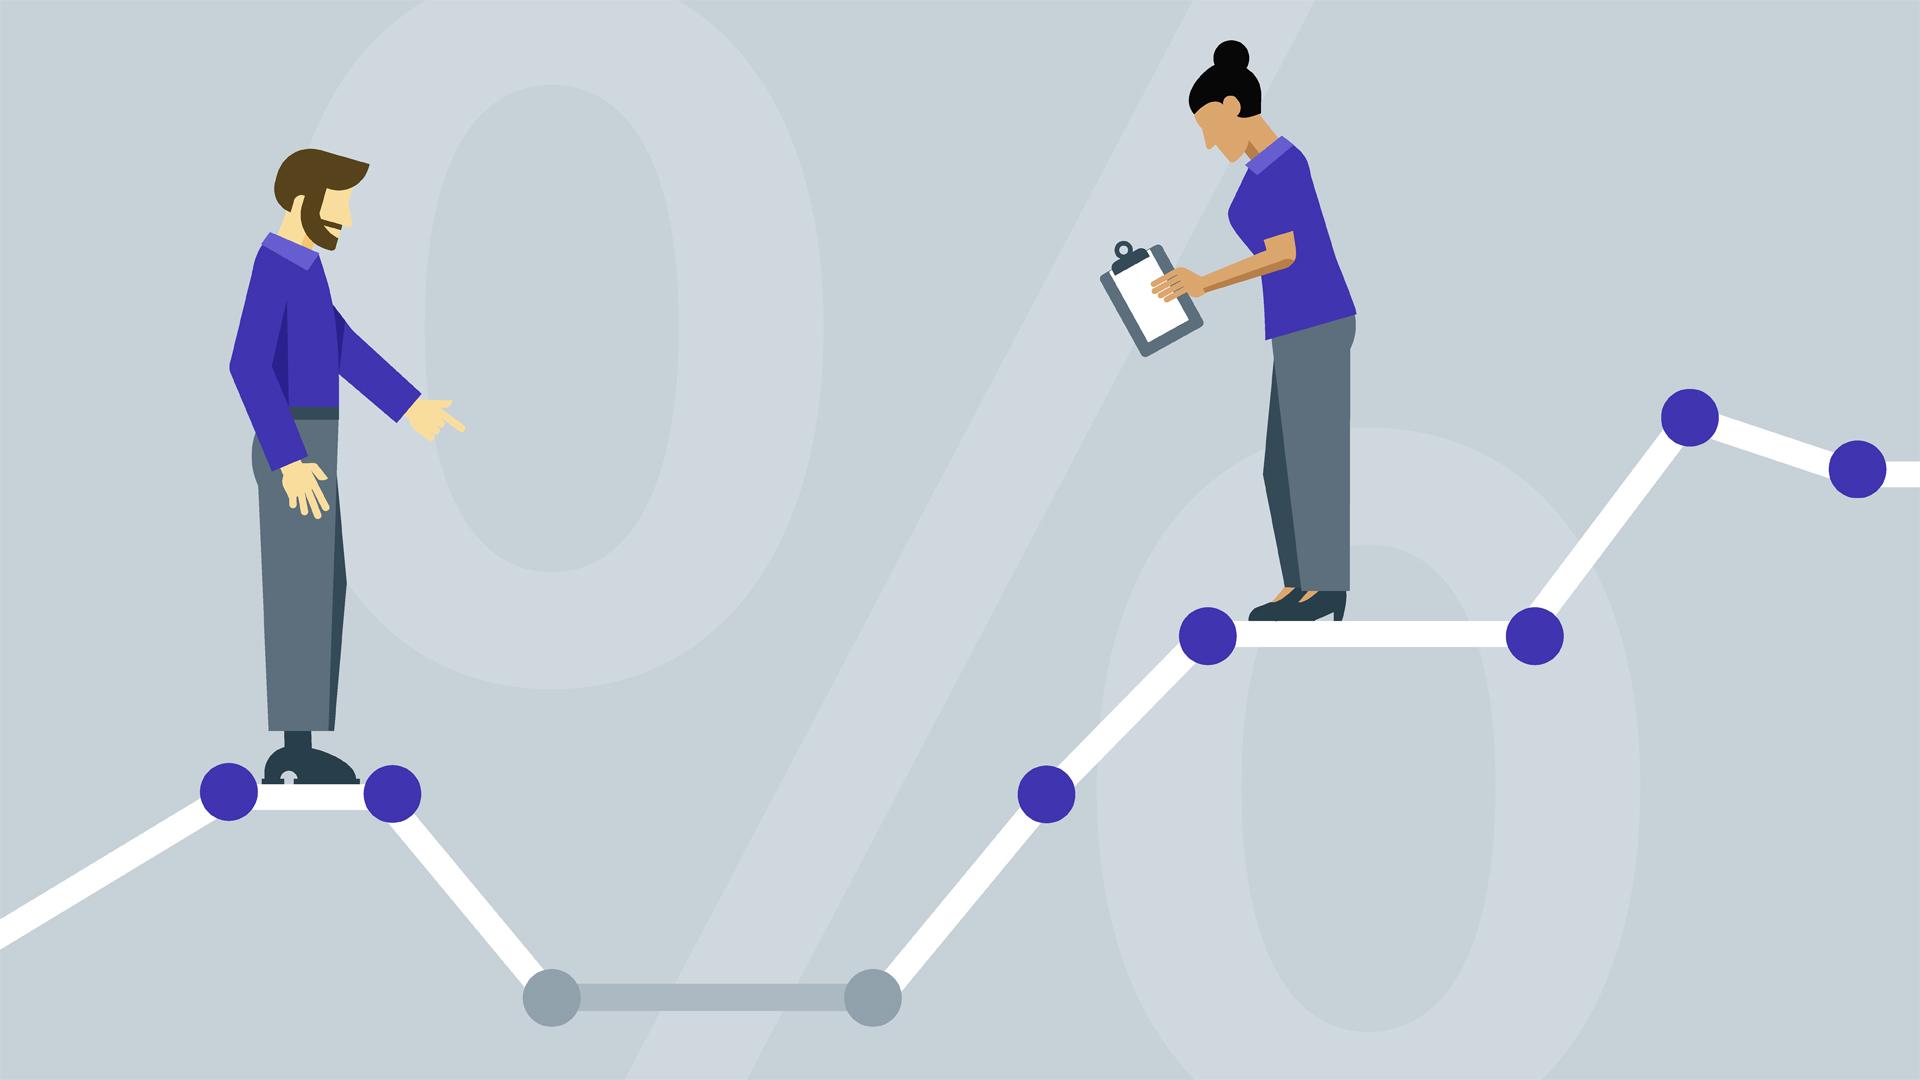 Instructional Design Needs Analysis